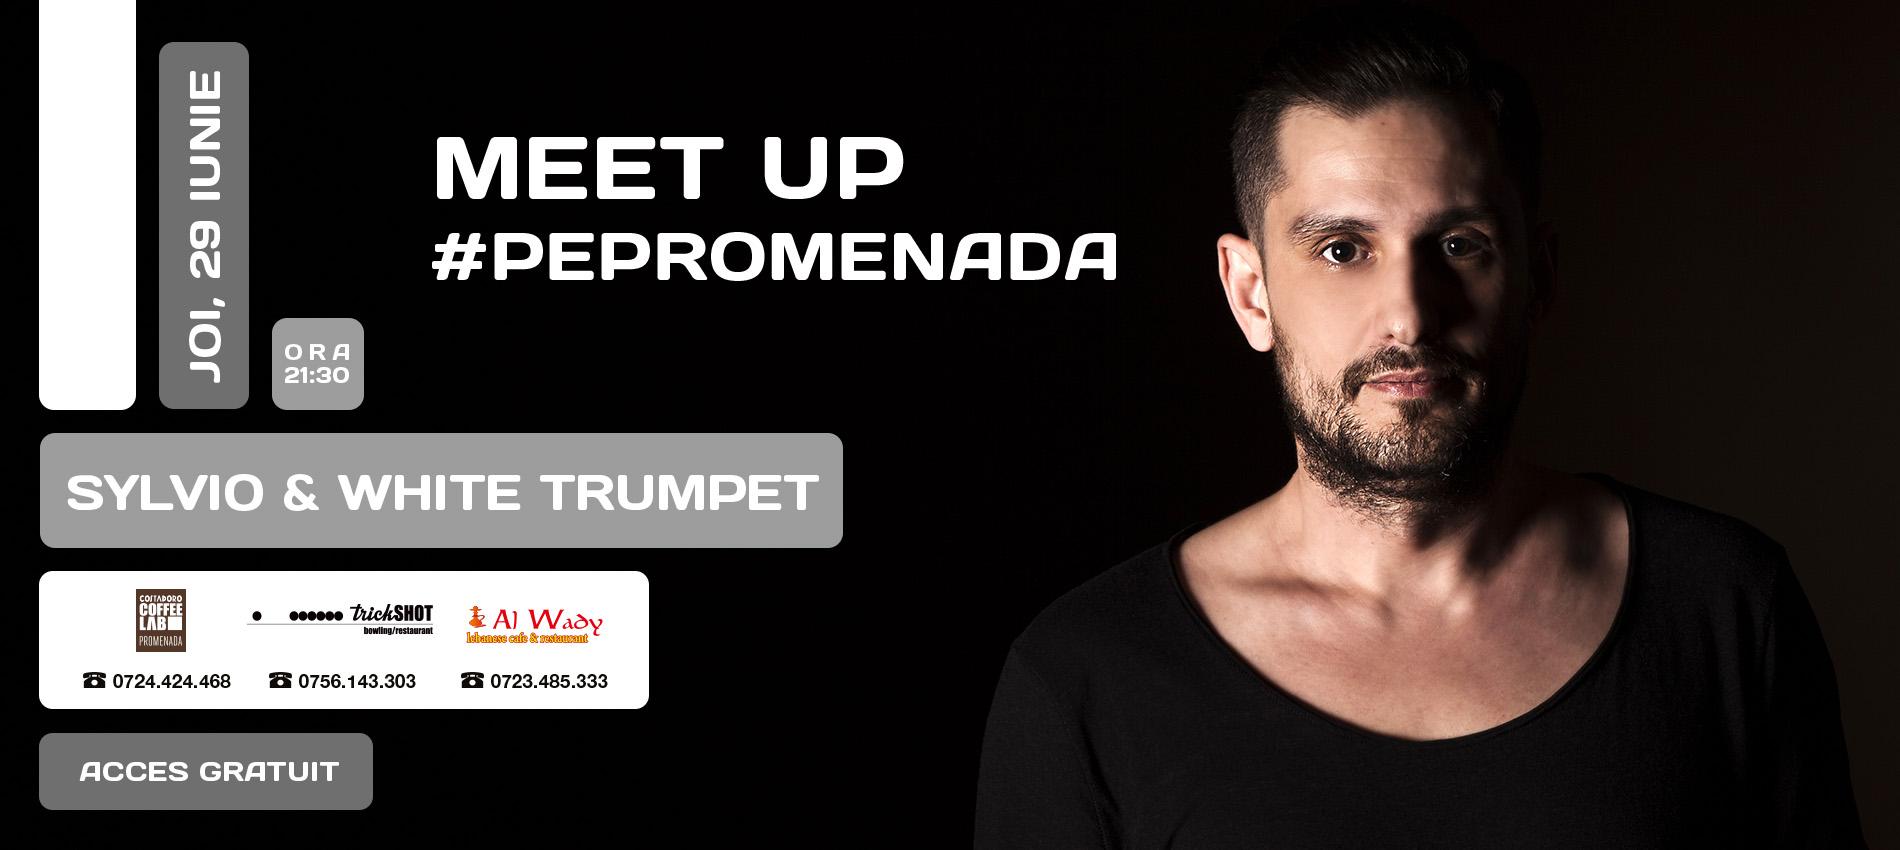 MEET UP #PePromenada   Sylvio & White Trumpet